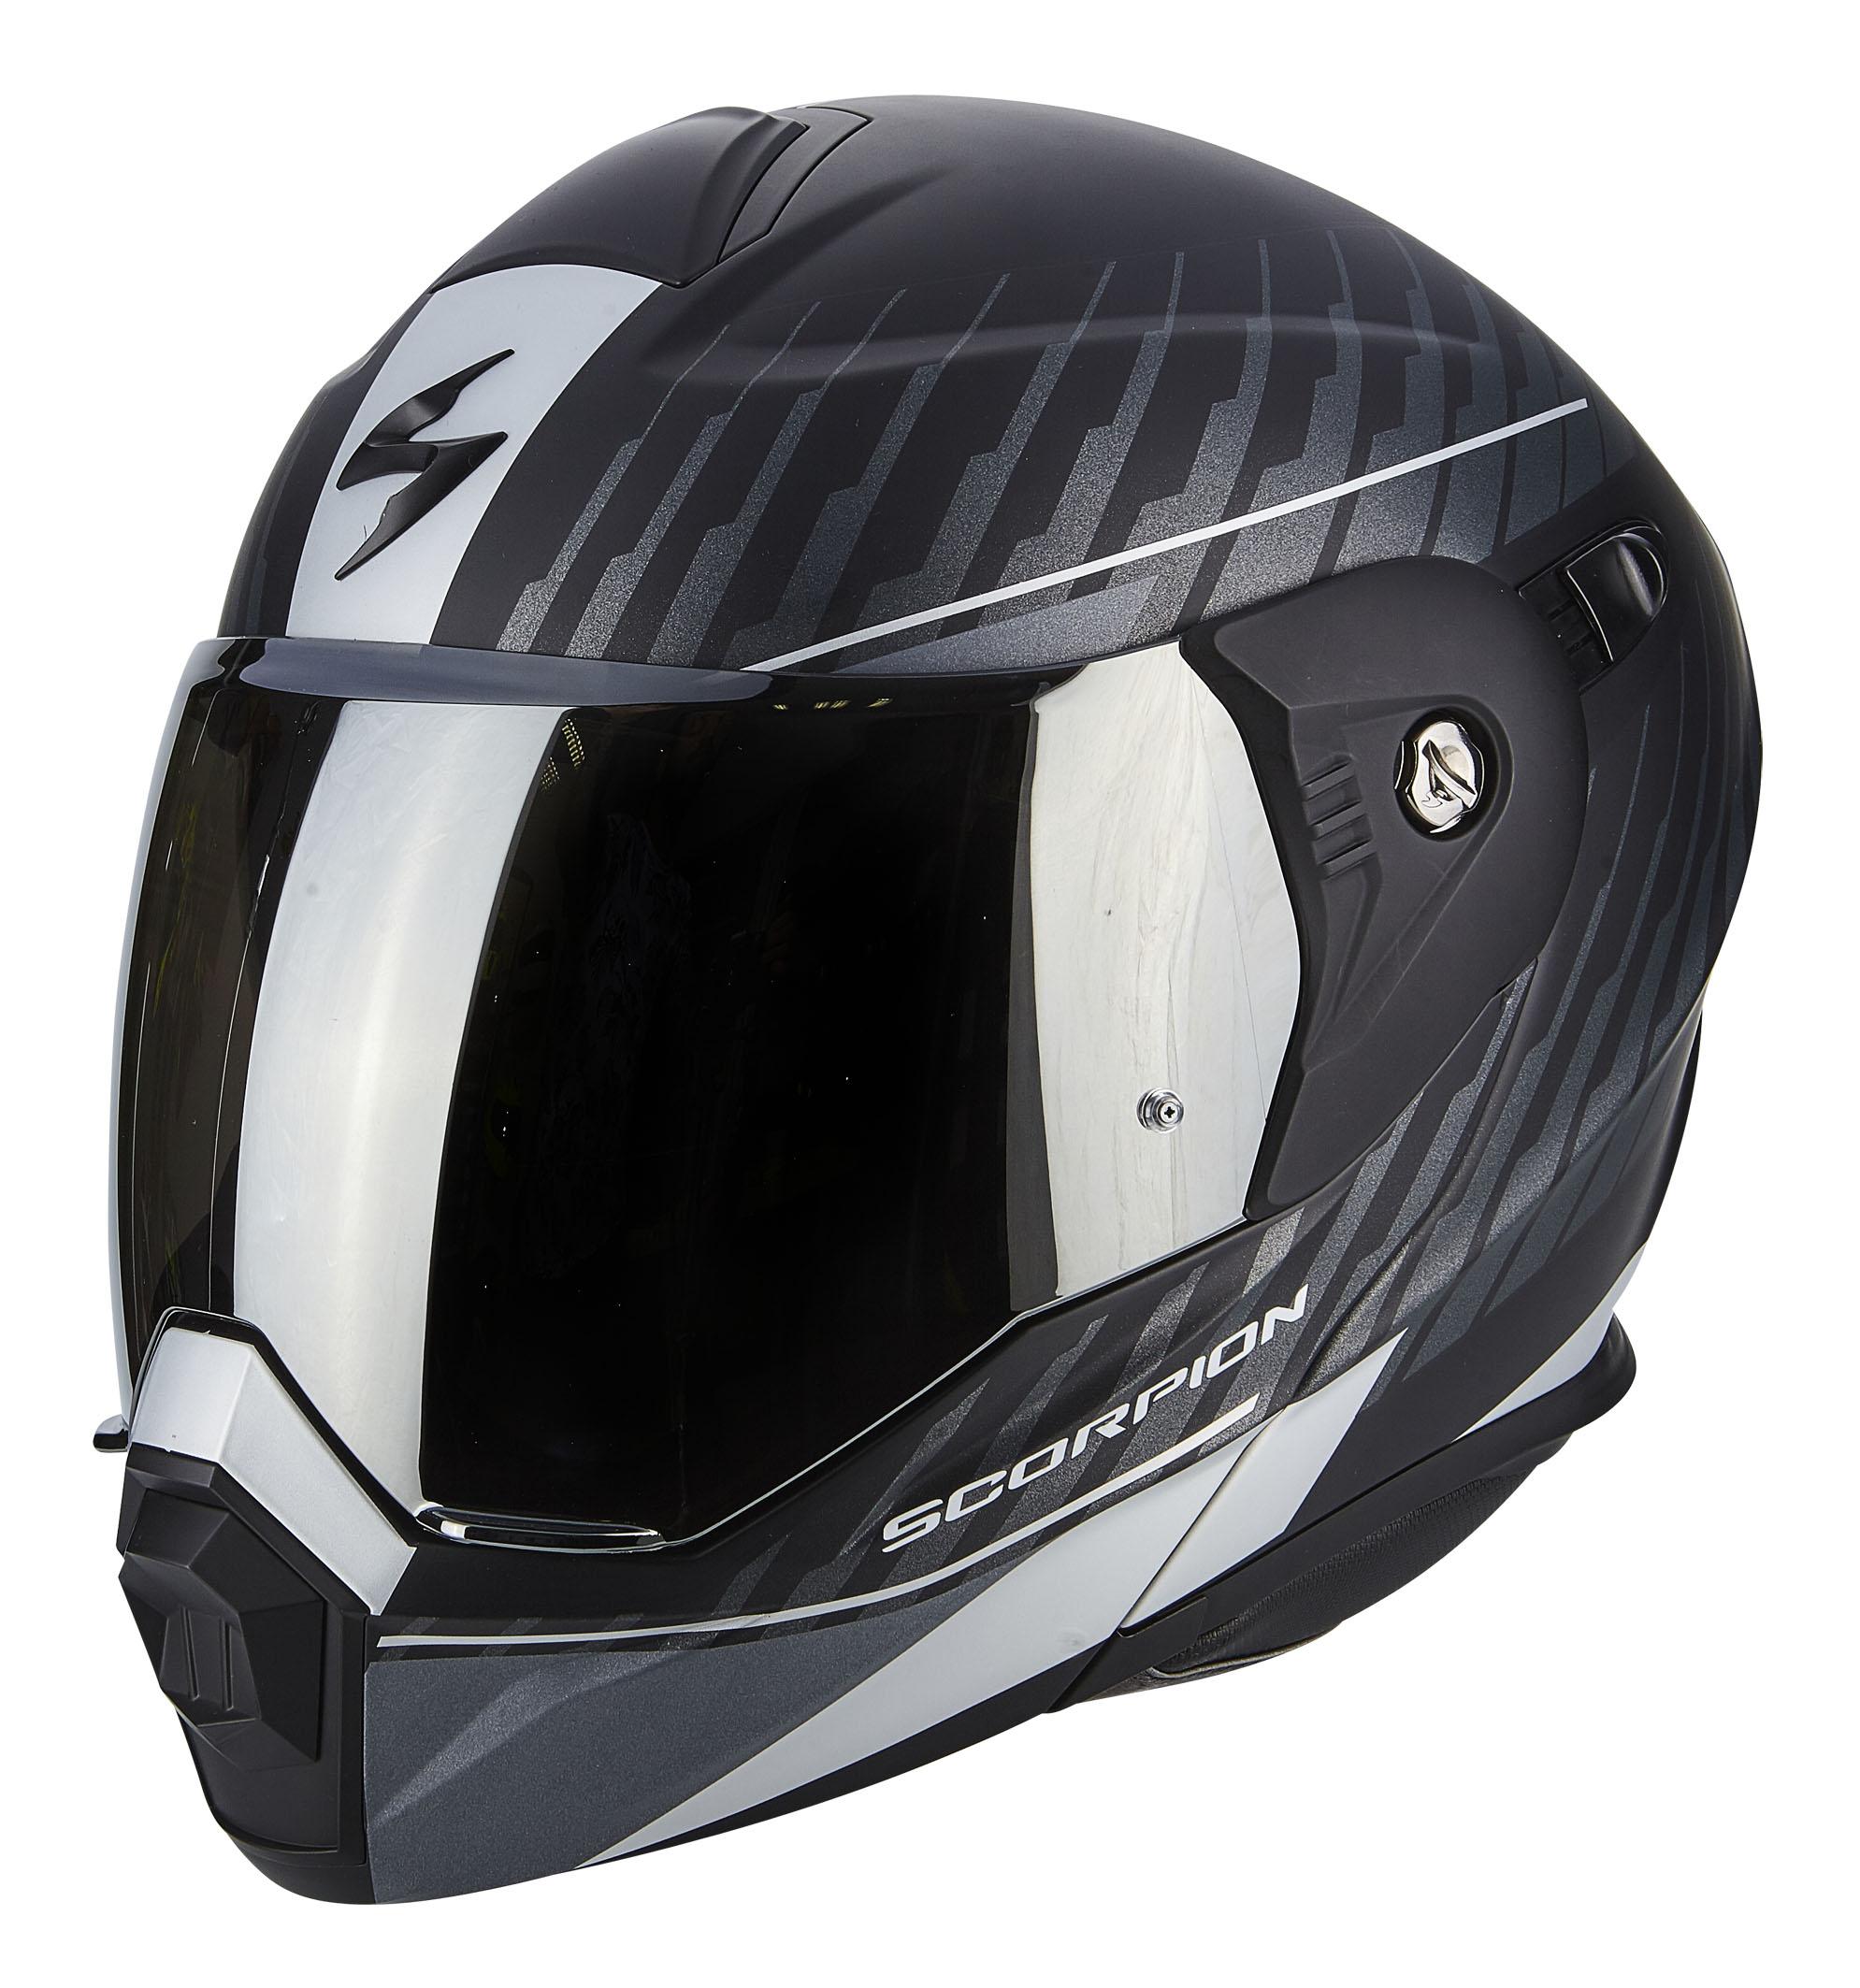 ADX-1 DUAL Matt Black-Silver-no visor (1)